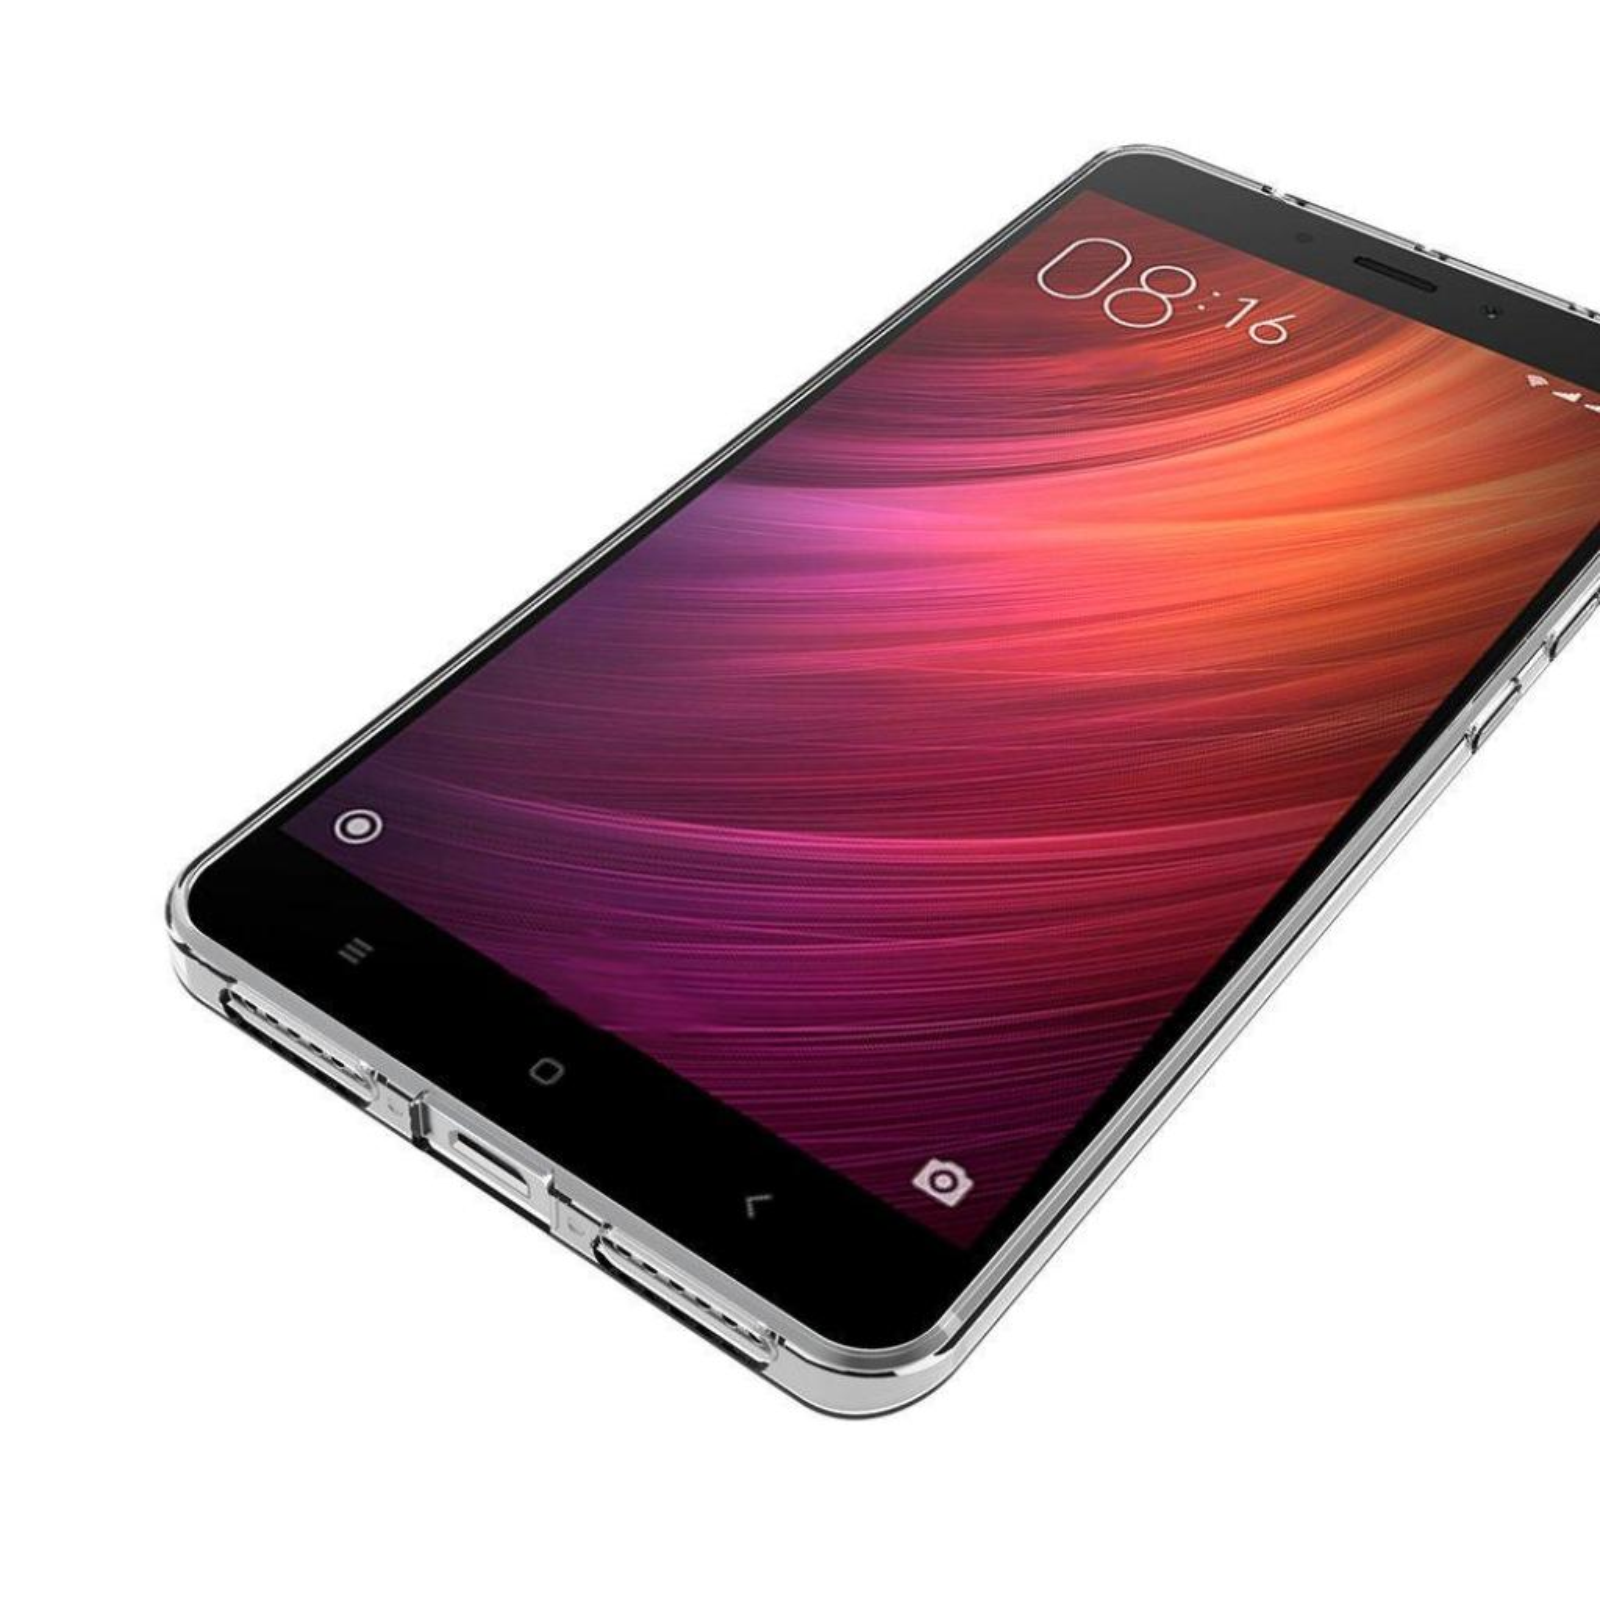 Чехол для моб. телефона SmartCase Xiaomi Redmi Note 4 TPU Clear (SC-RMIN4) изображение 6